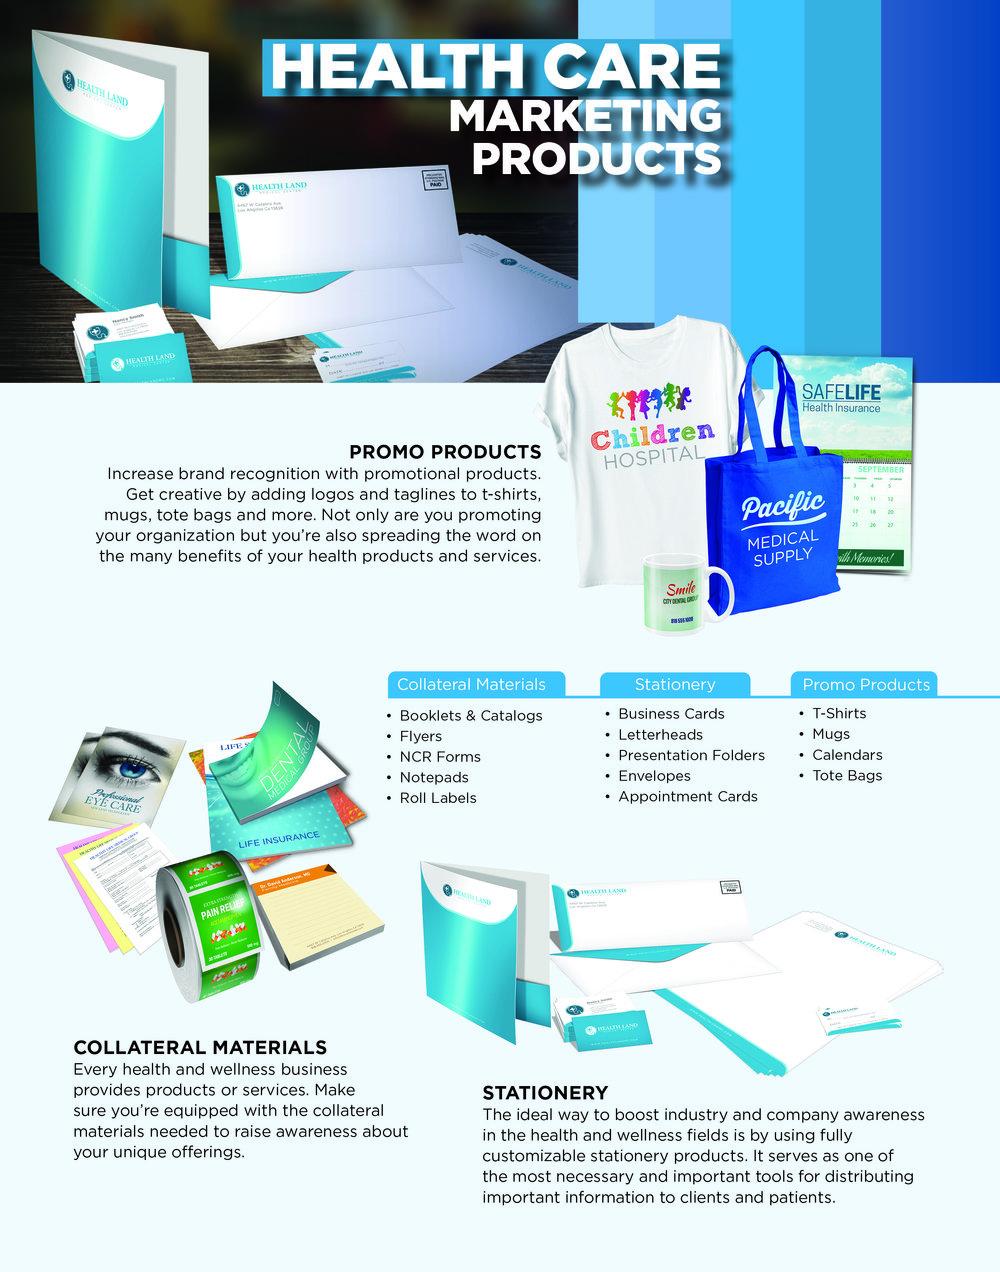 HealthCare_Marketing.jpg